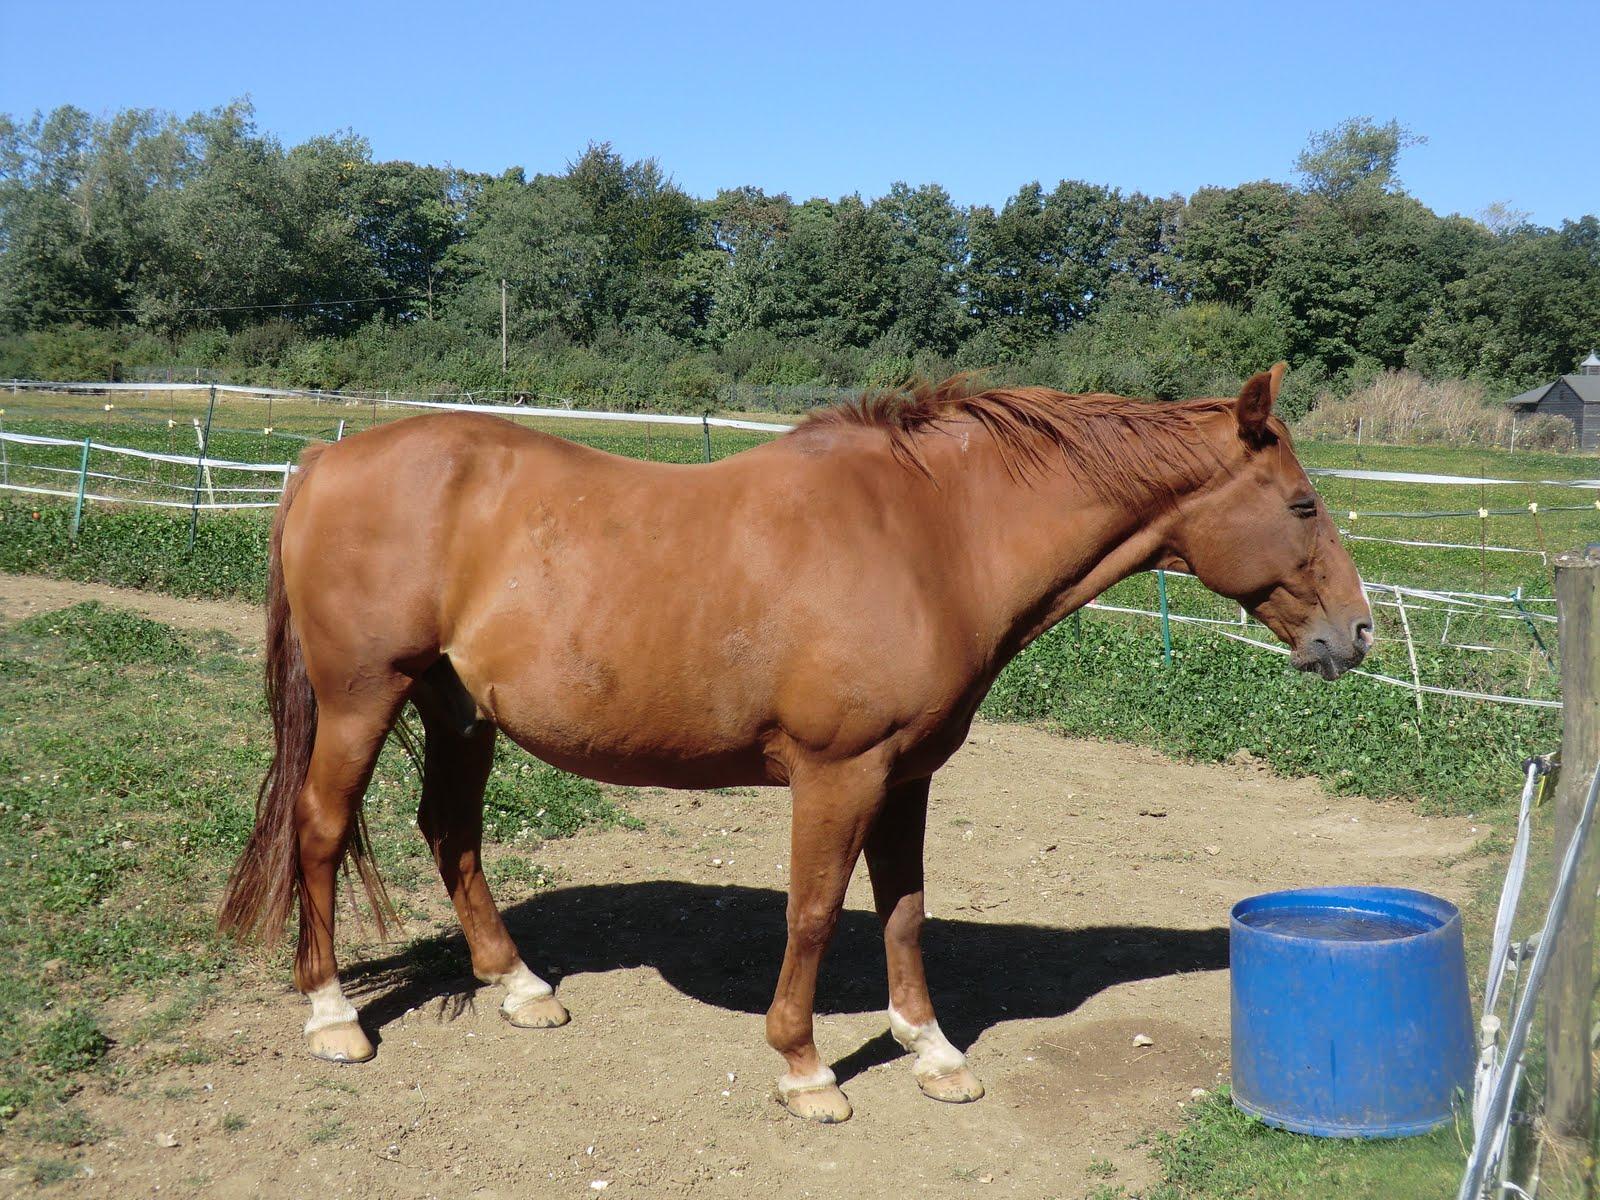 CIMG3891 Horse, Henley Street